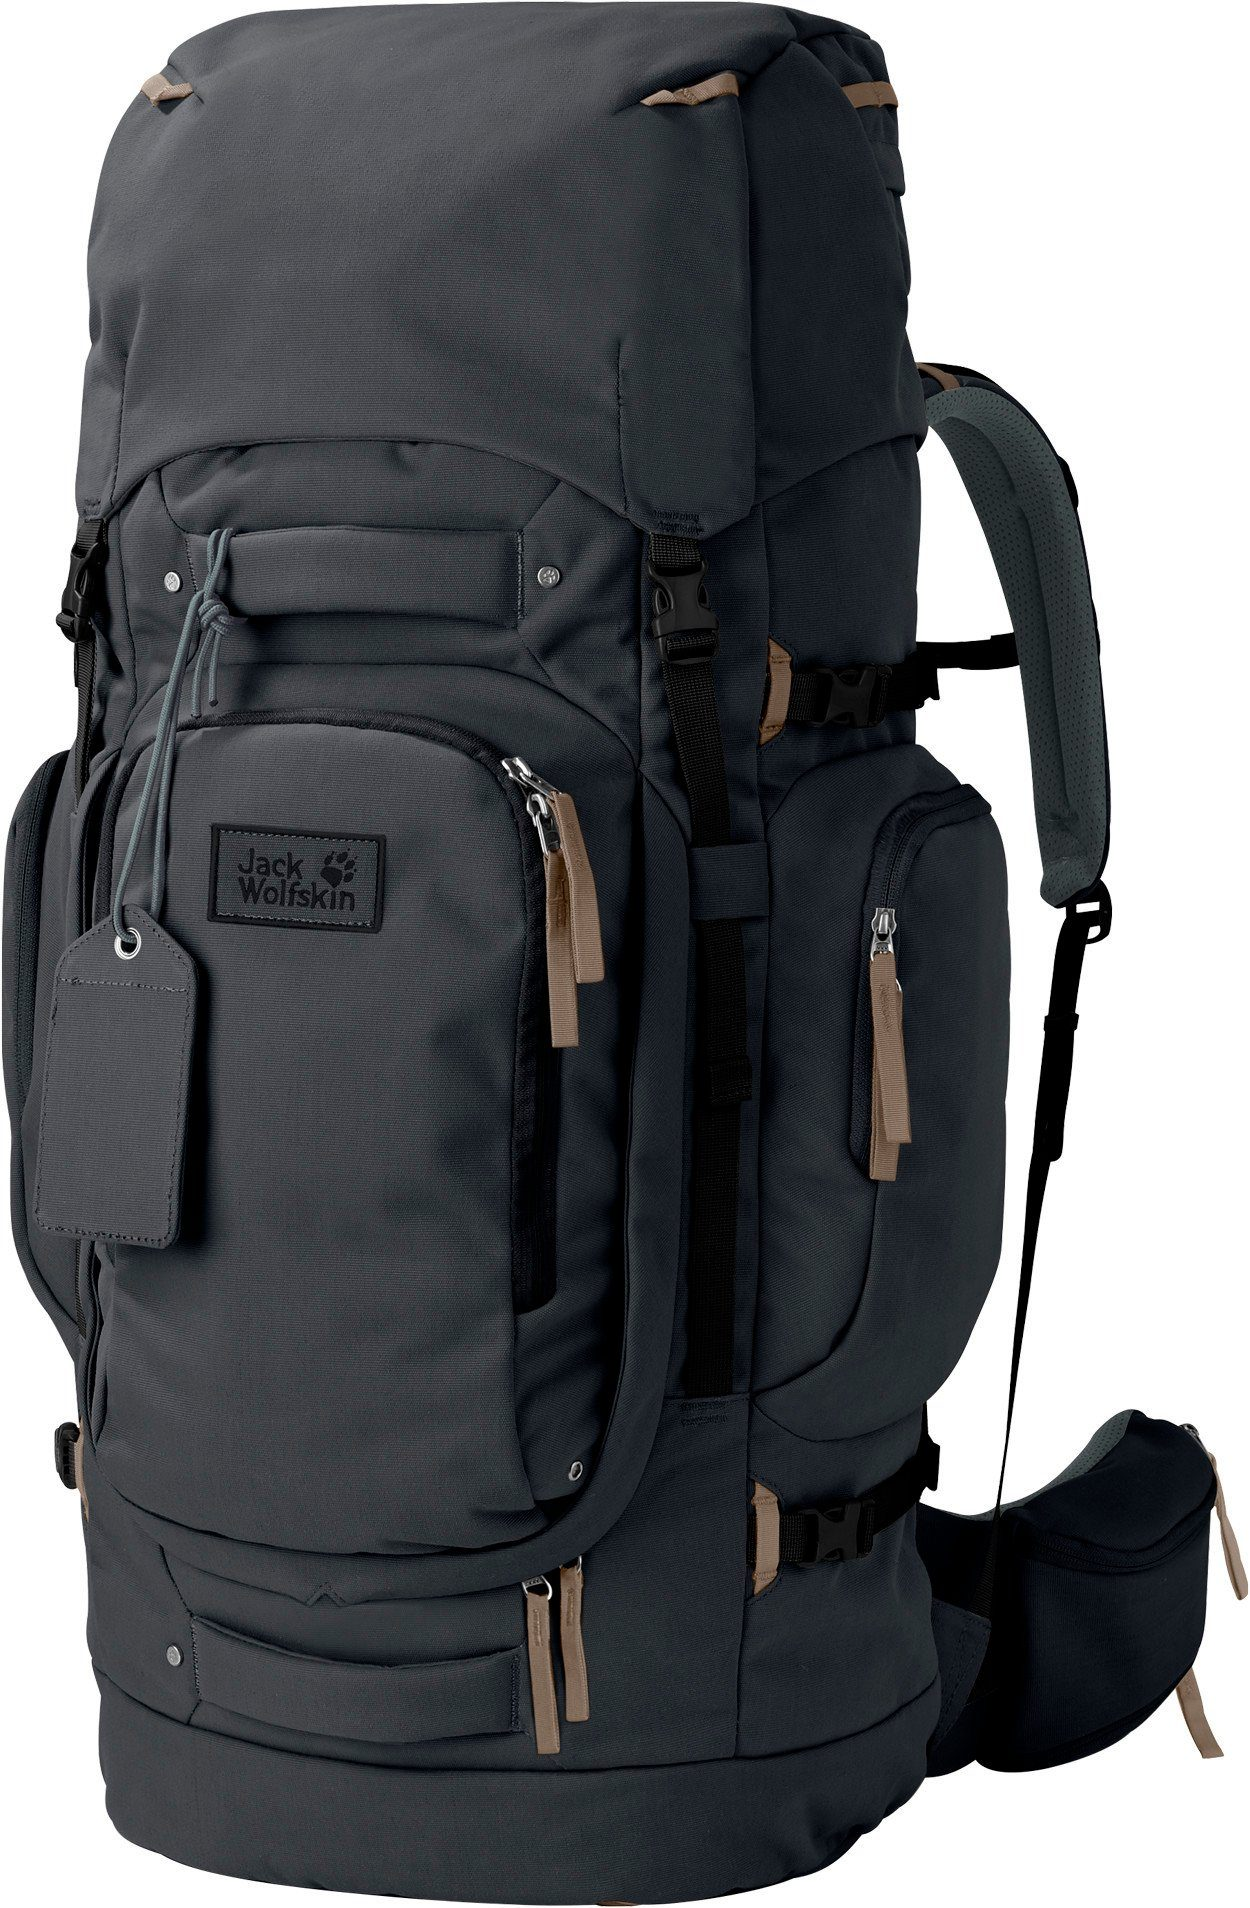 Jack Wolfskin Wanderrucksack »Freeman 65 Pack«